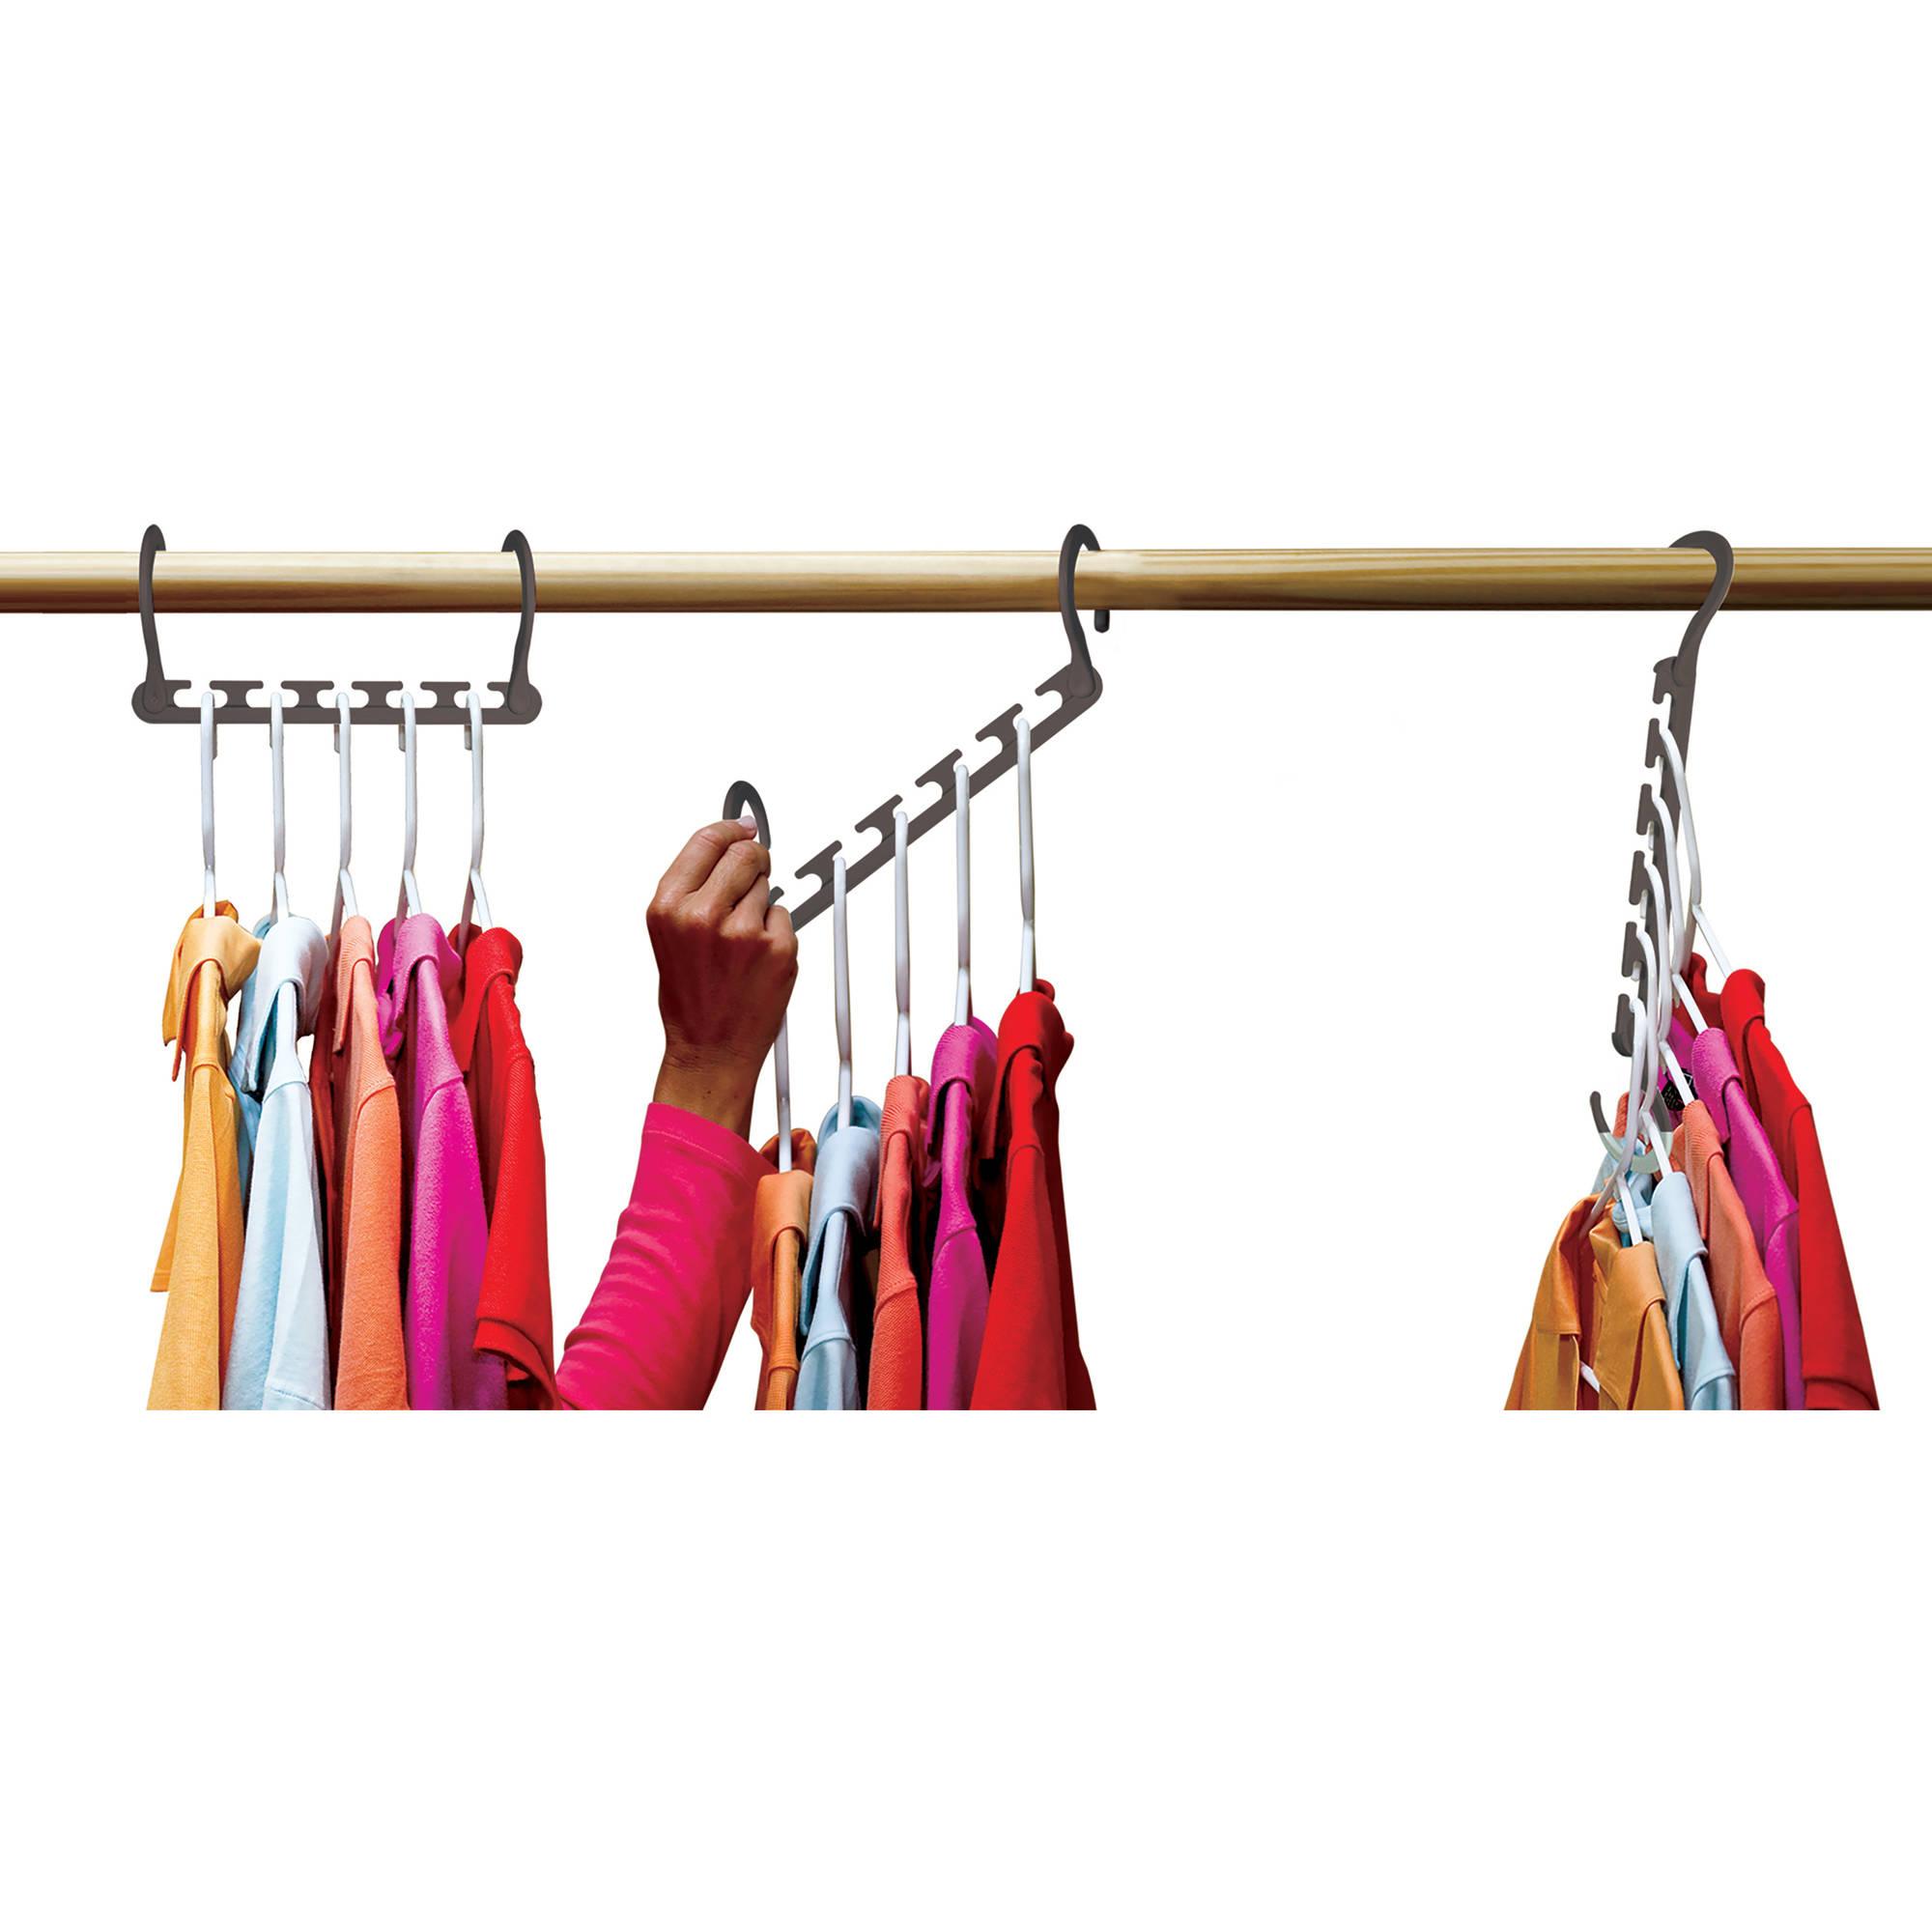 Lot 25 Closet Space Builder Clothes Organizer Saver Magic Hangers As Seen On TV